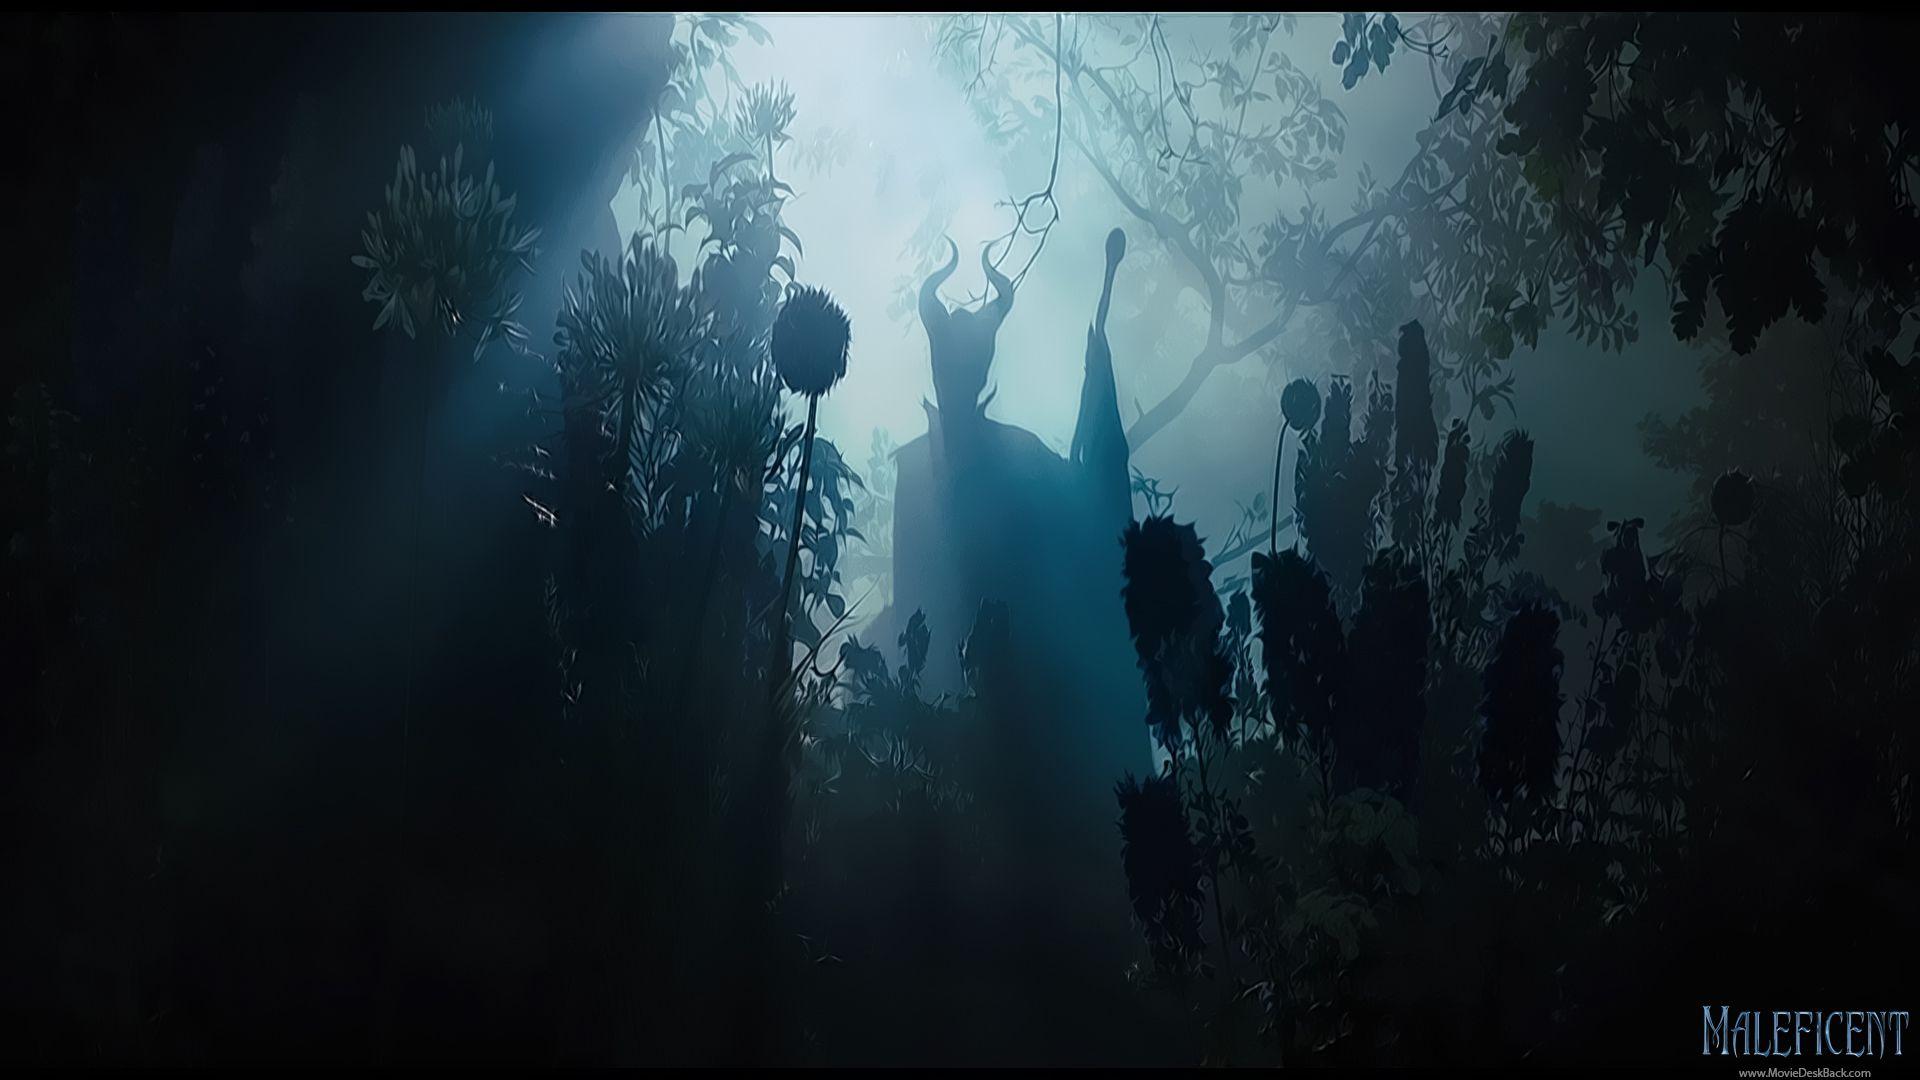 research Maleficient Pinterest Maleficent Wallpaper